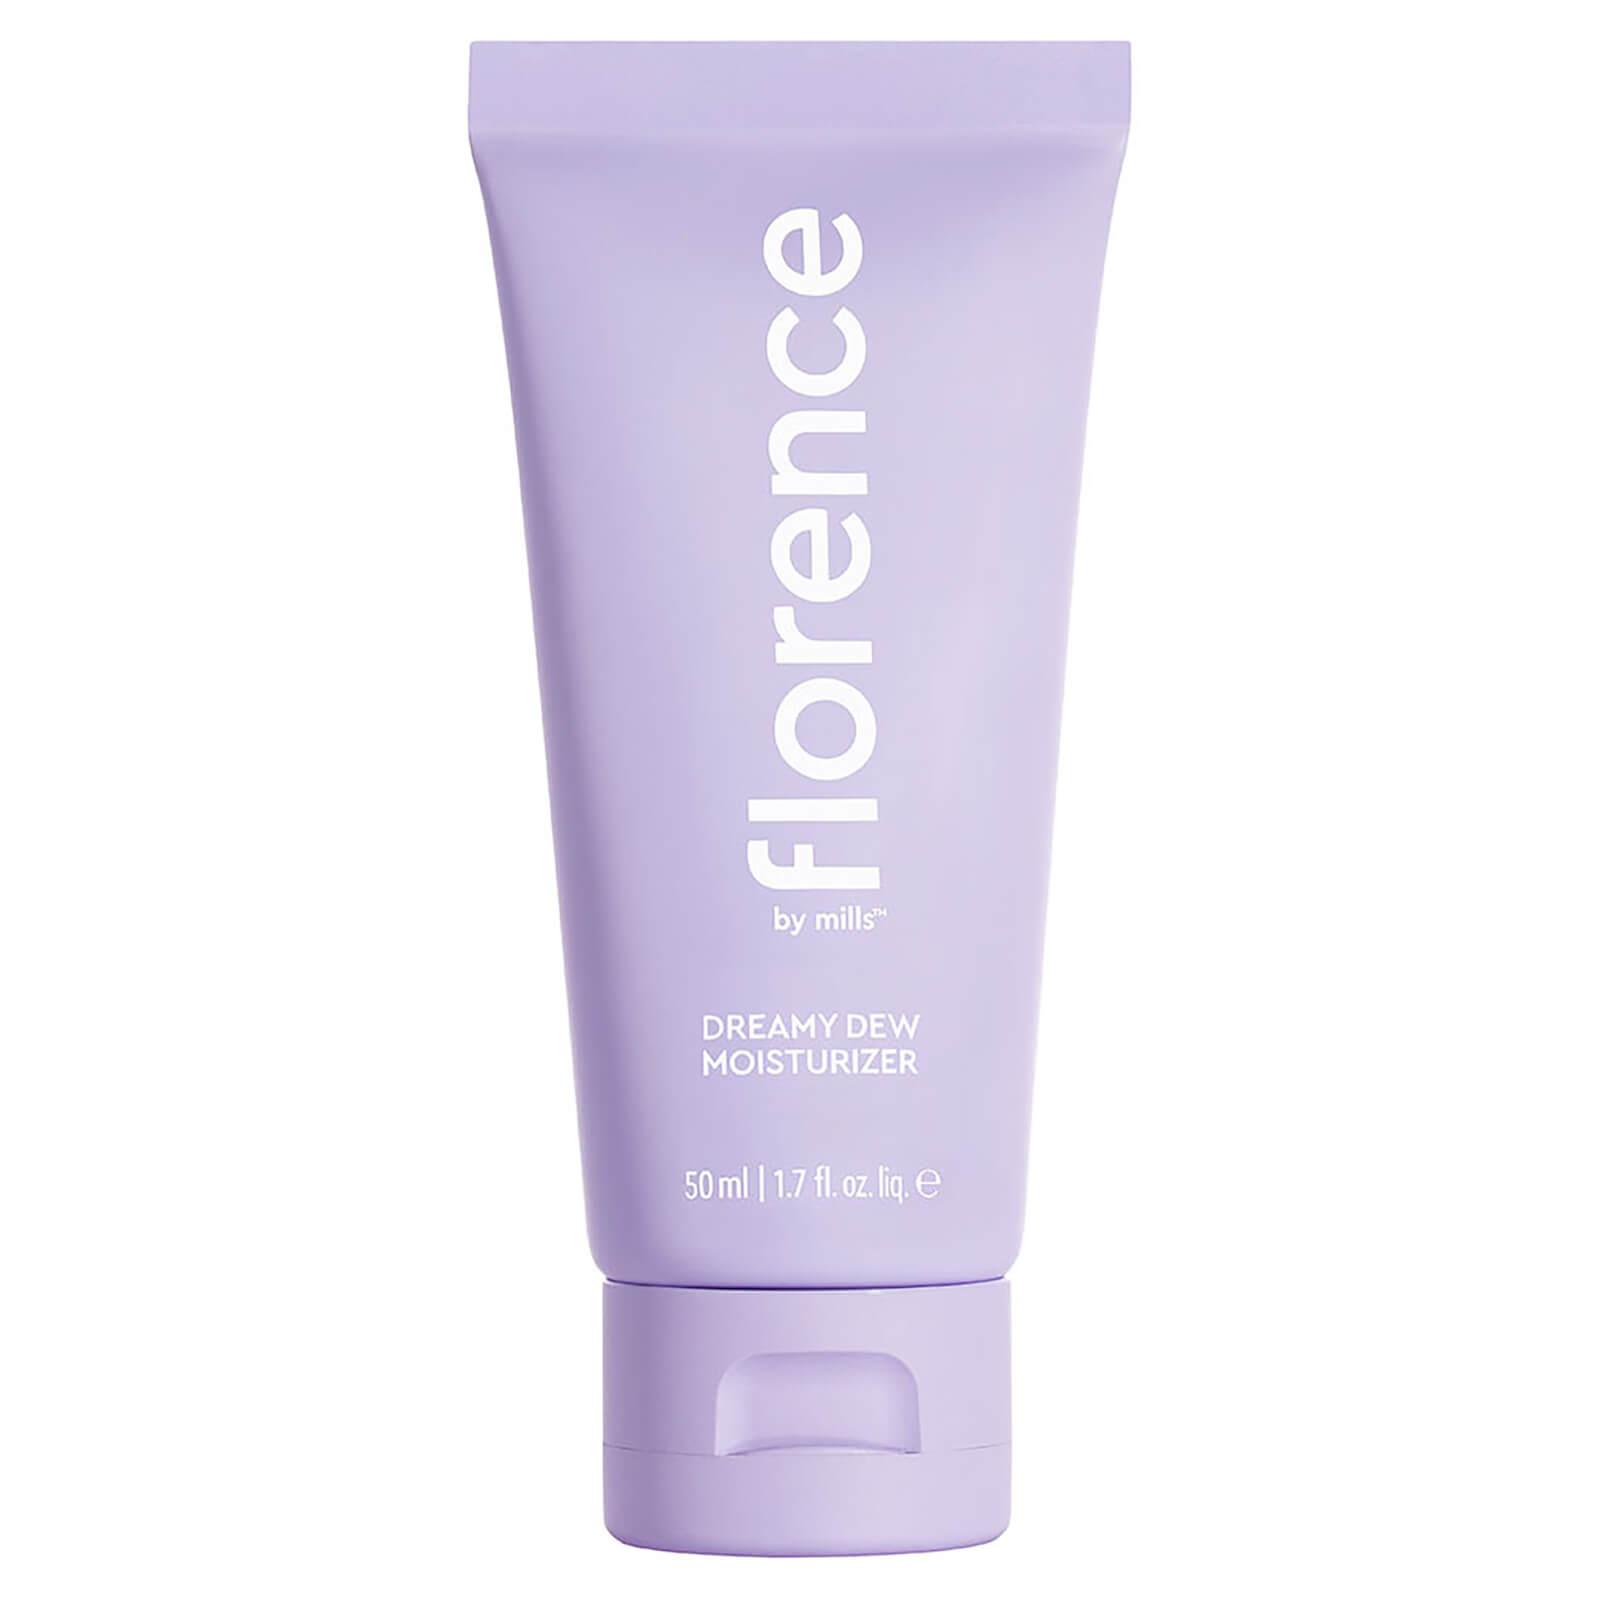 Купить Florence by Mills Dreamy Dew Moisturiser 50ml